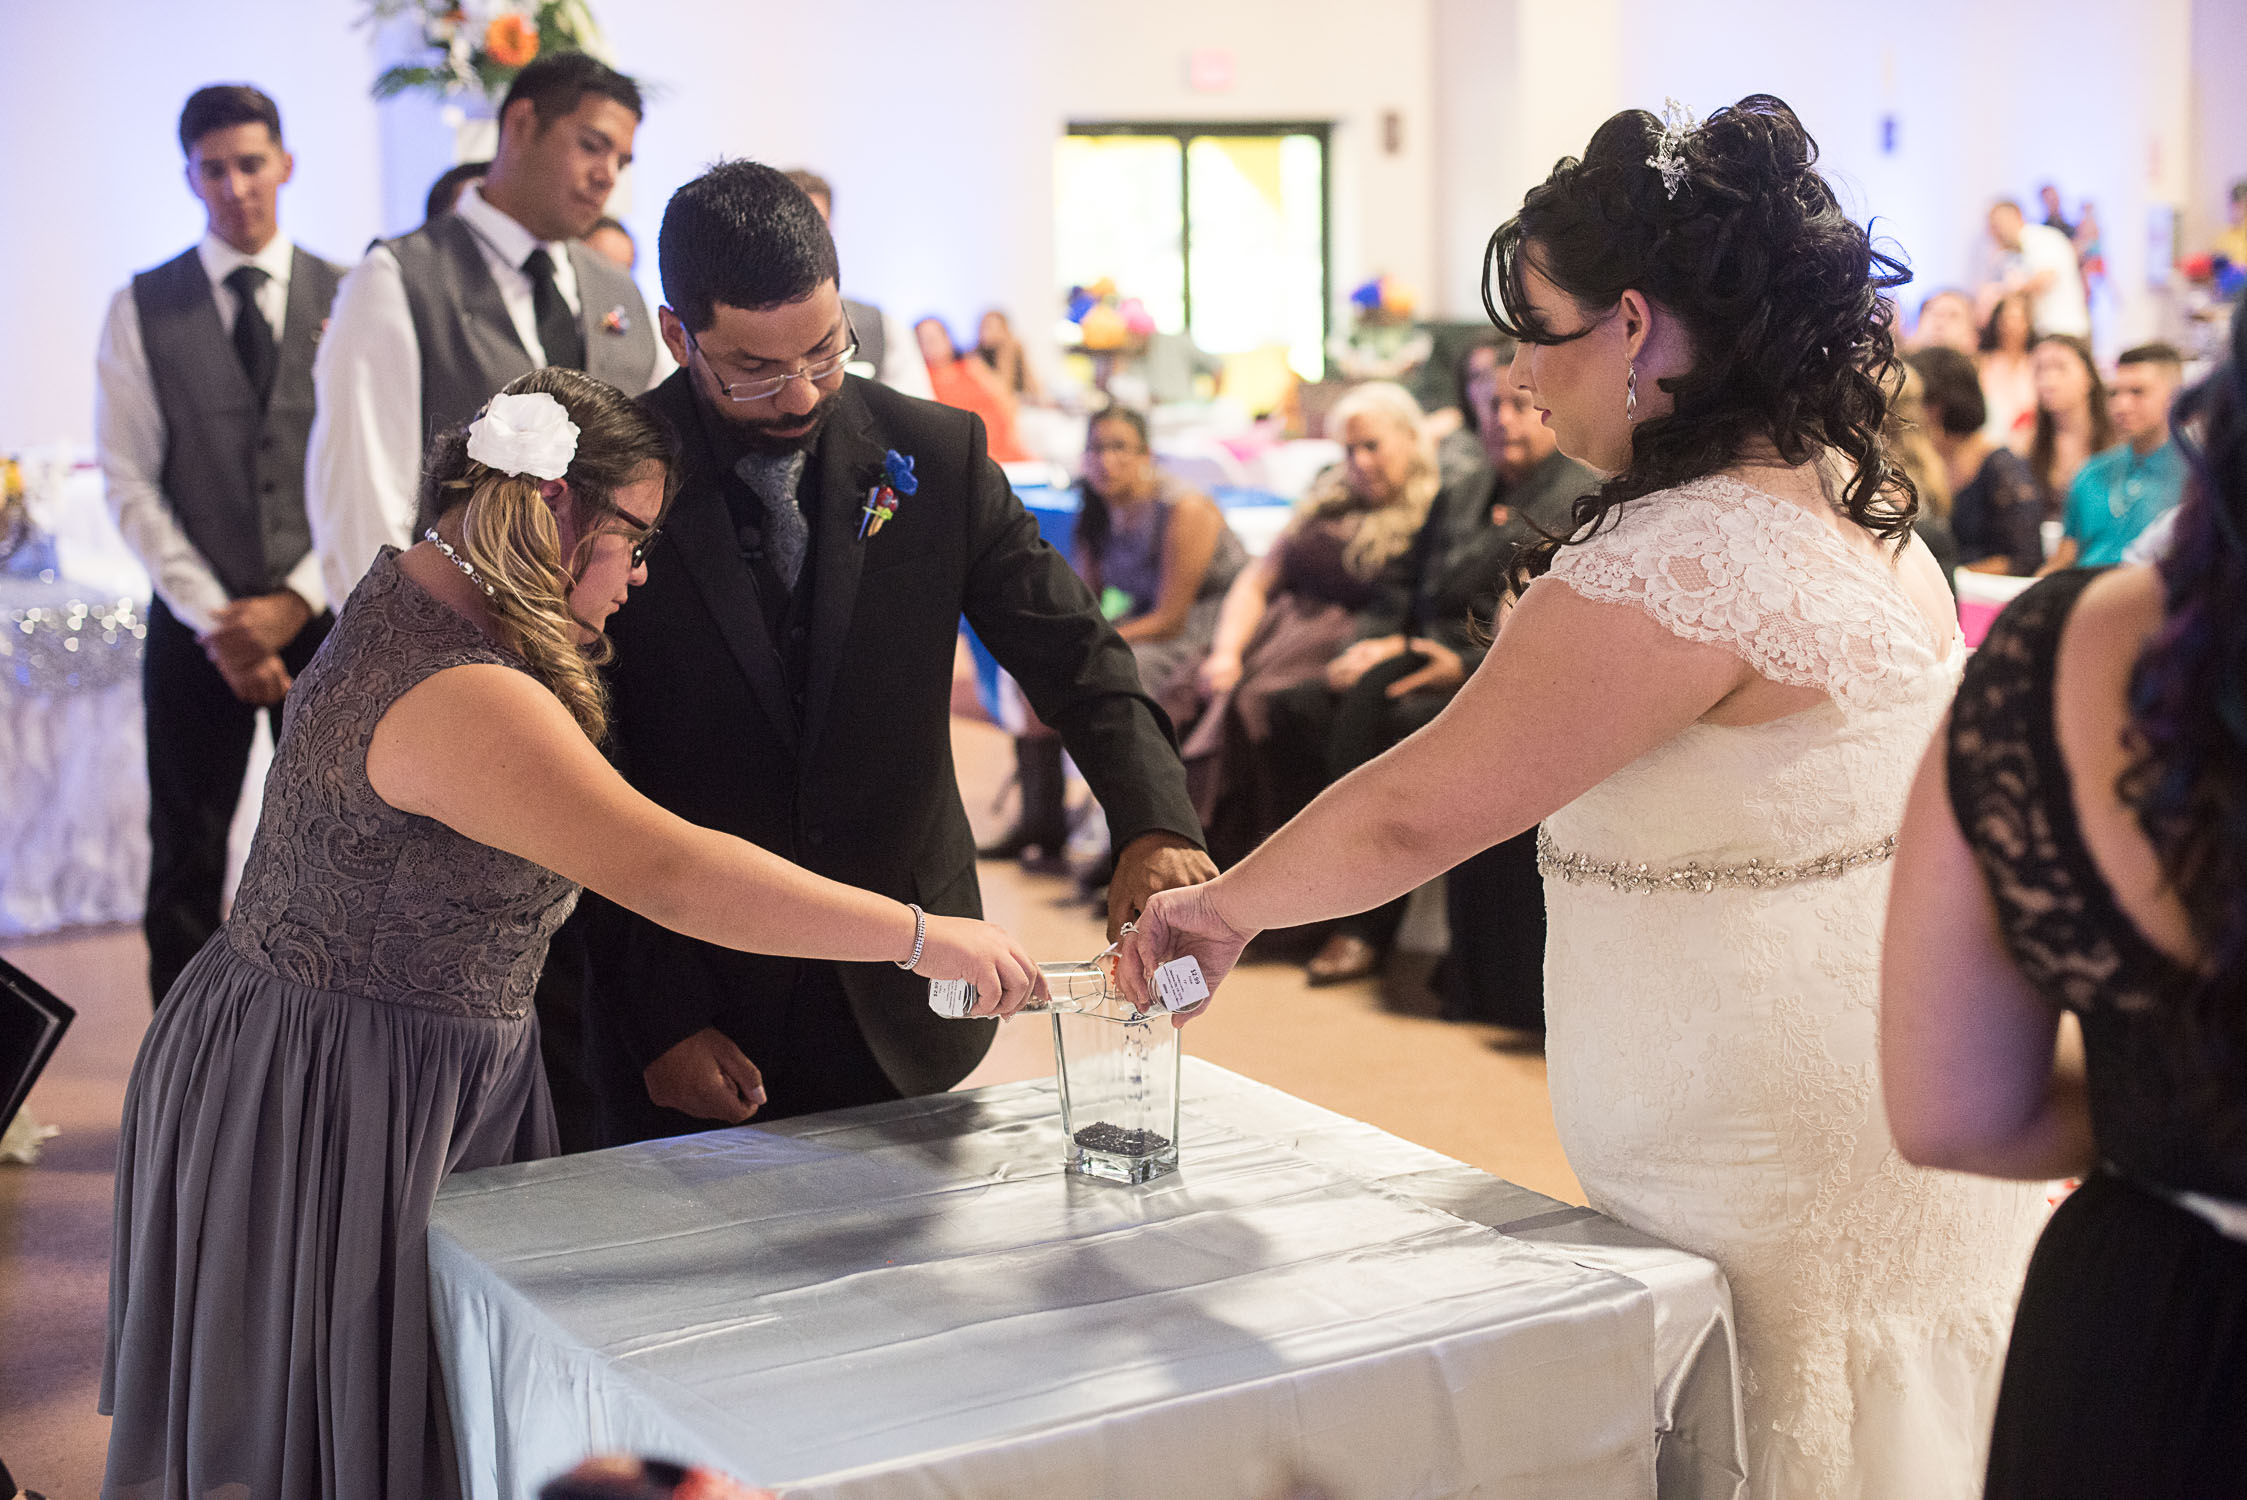 Leal Wedding Mira Visu Photography-120.jpg